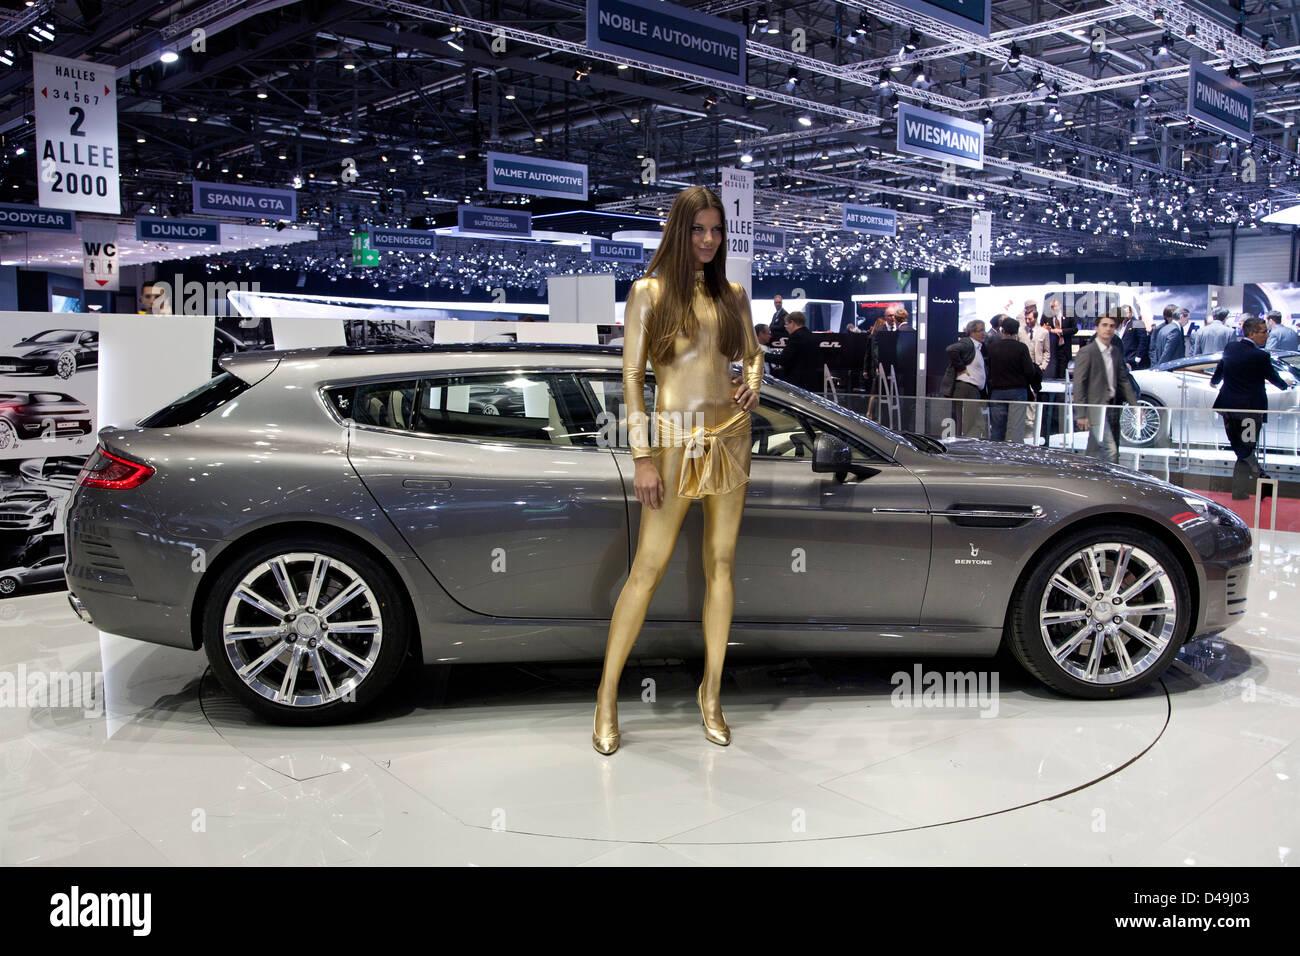 Bertone Jet 2 + 2 Familienstil Aston Martin Rapide. Genfer Autosalon 2013 Stockbild